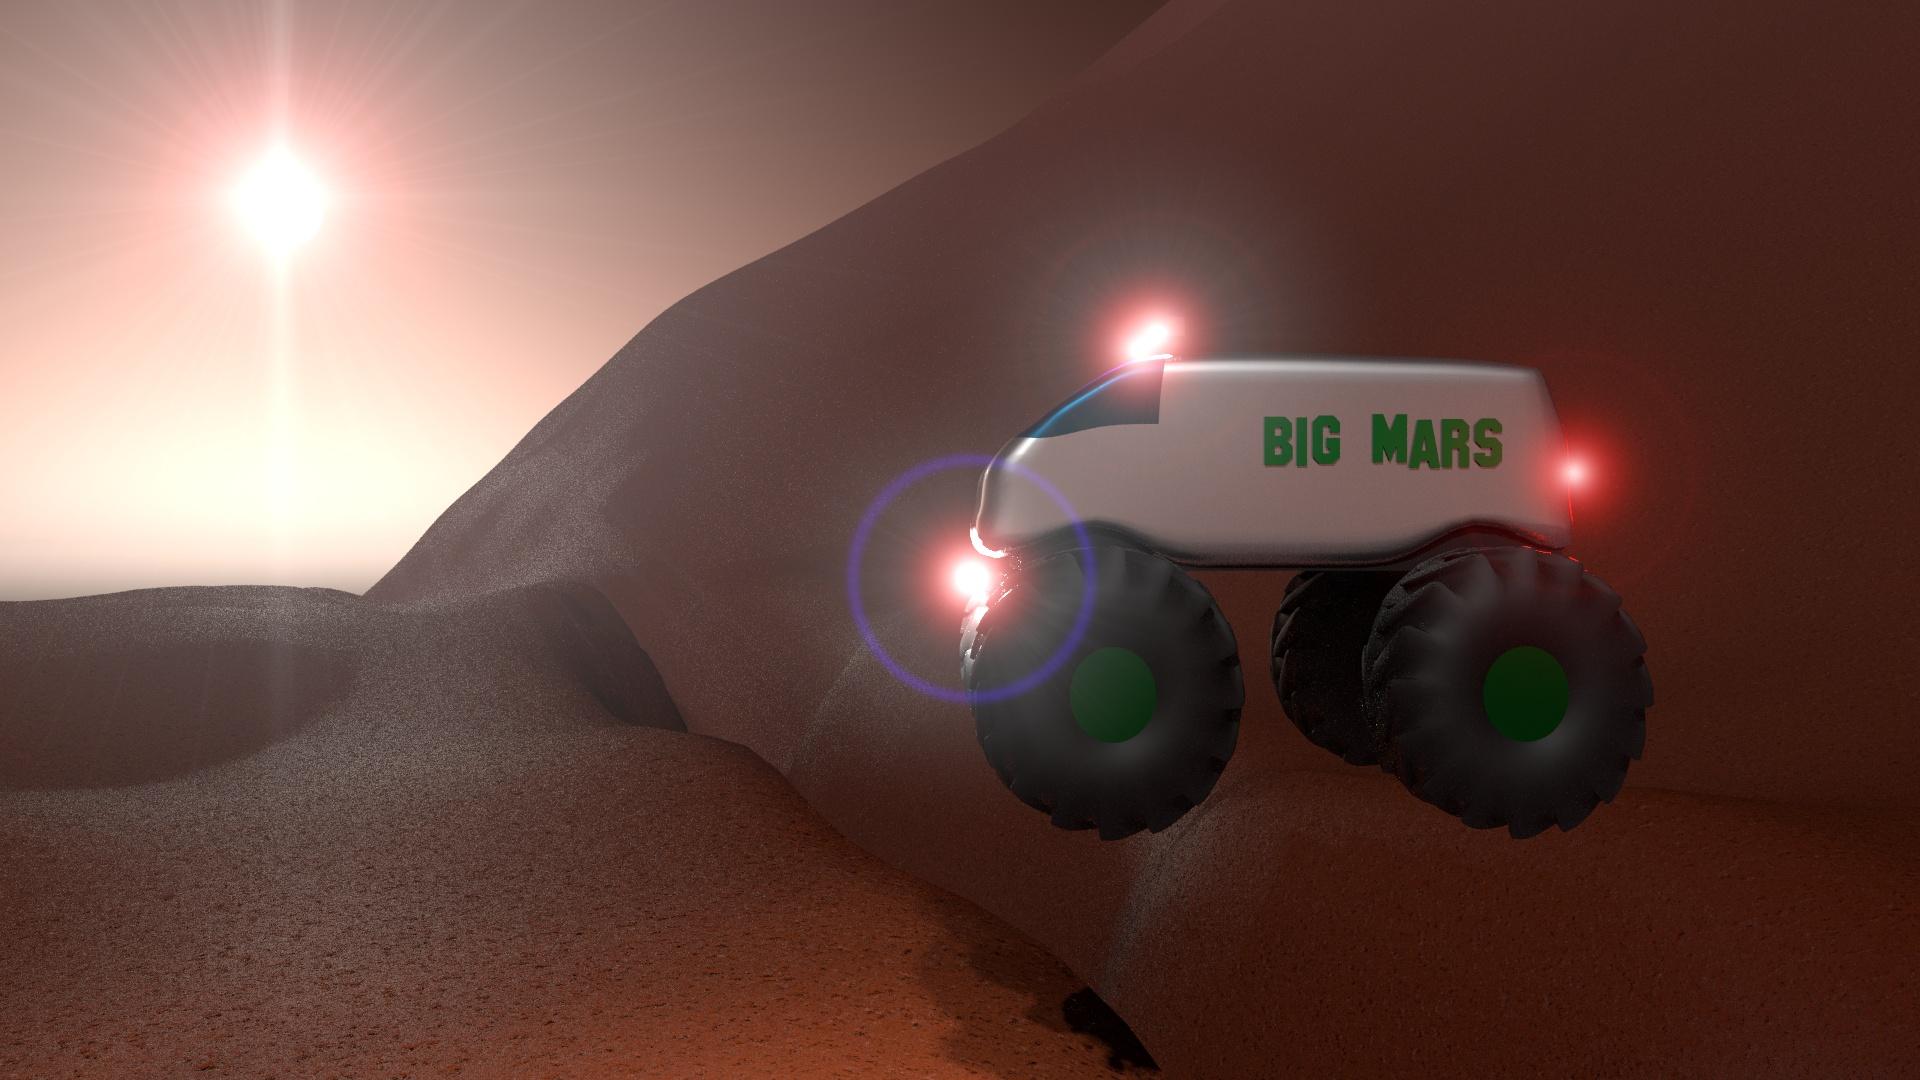 Space Rover 2020 Challenge - Big Mars